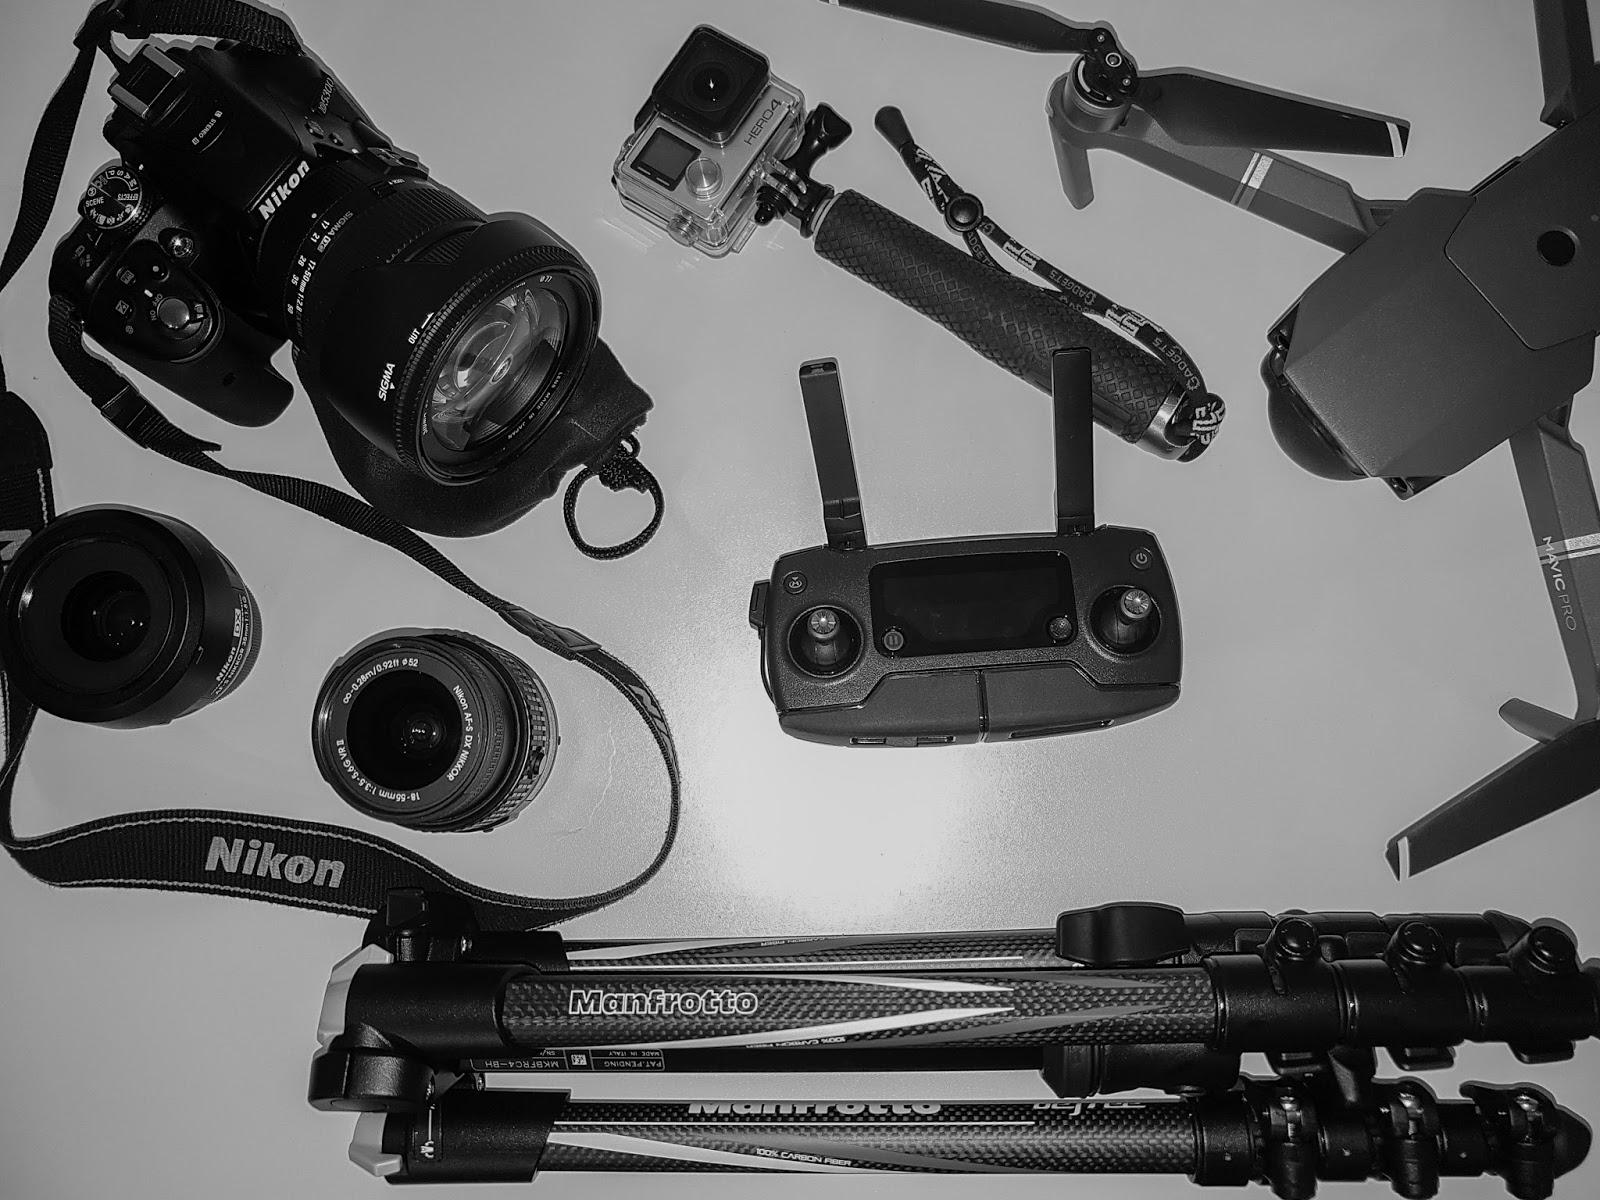 equipamentos fotografia nikon drone dji